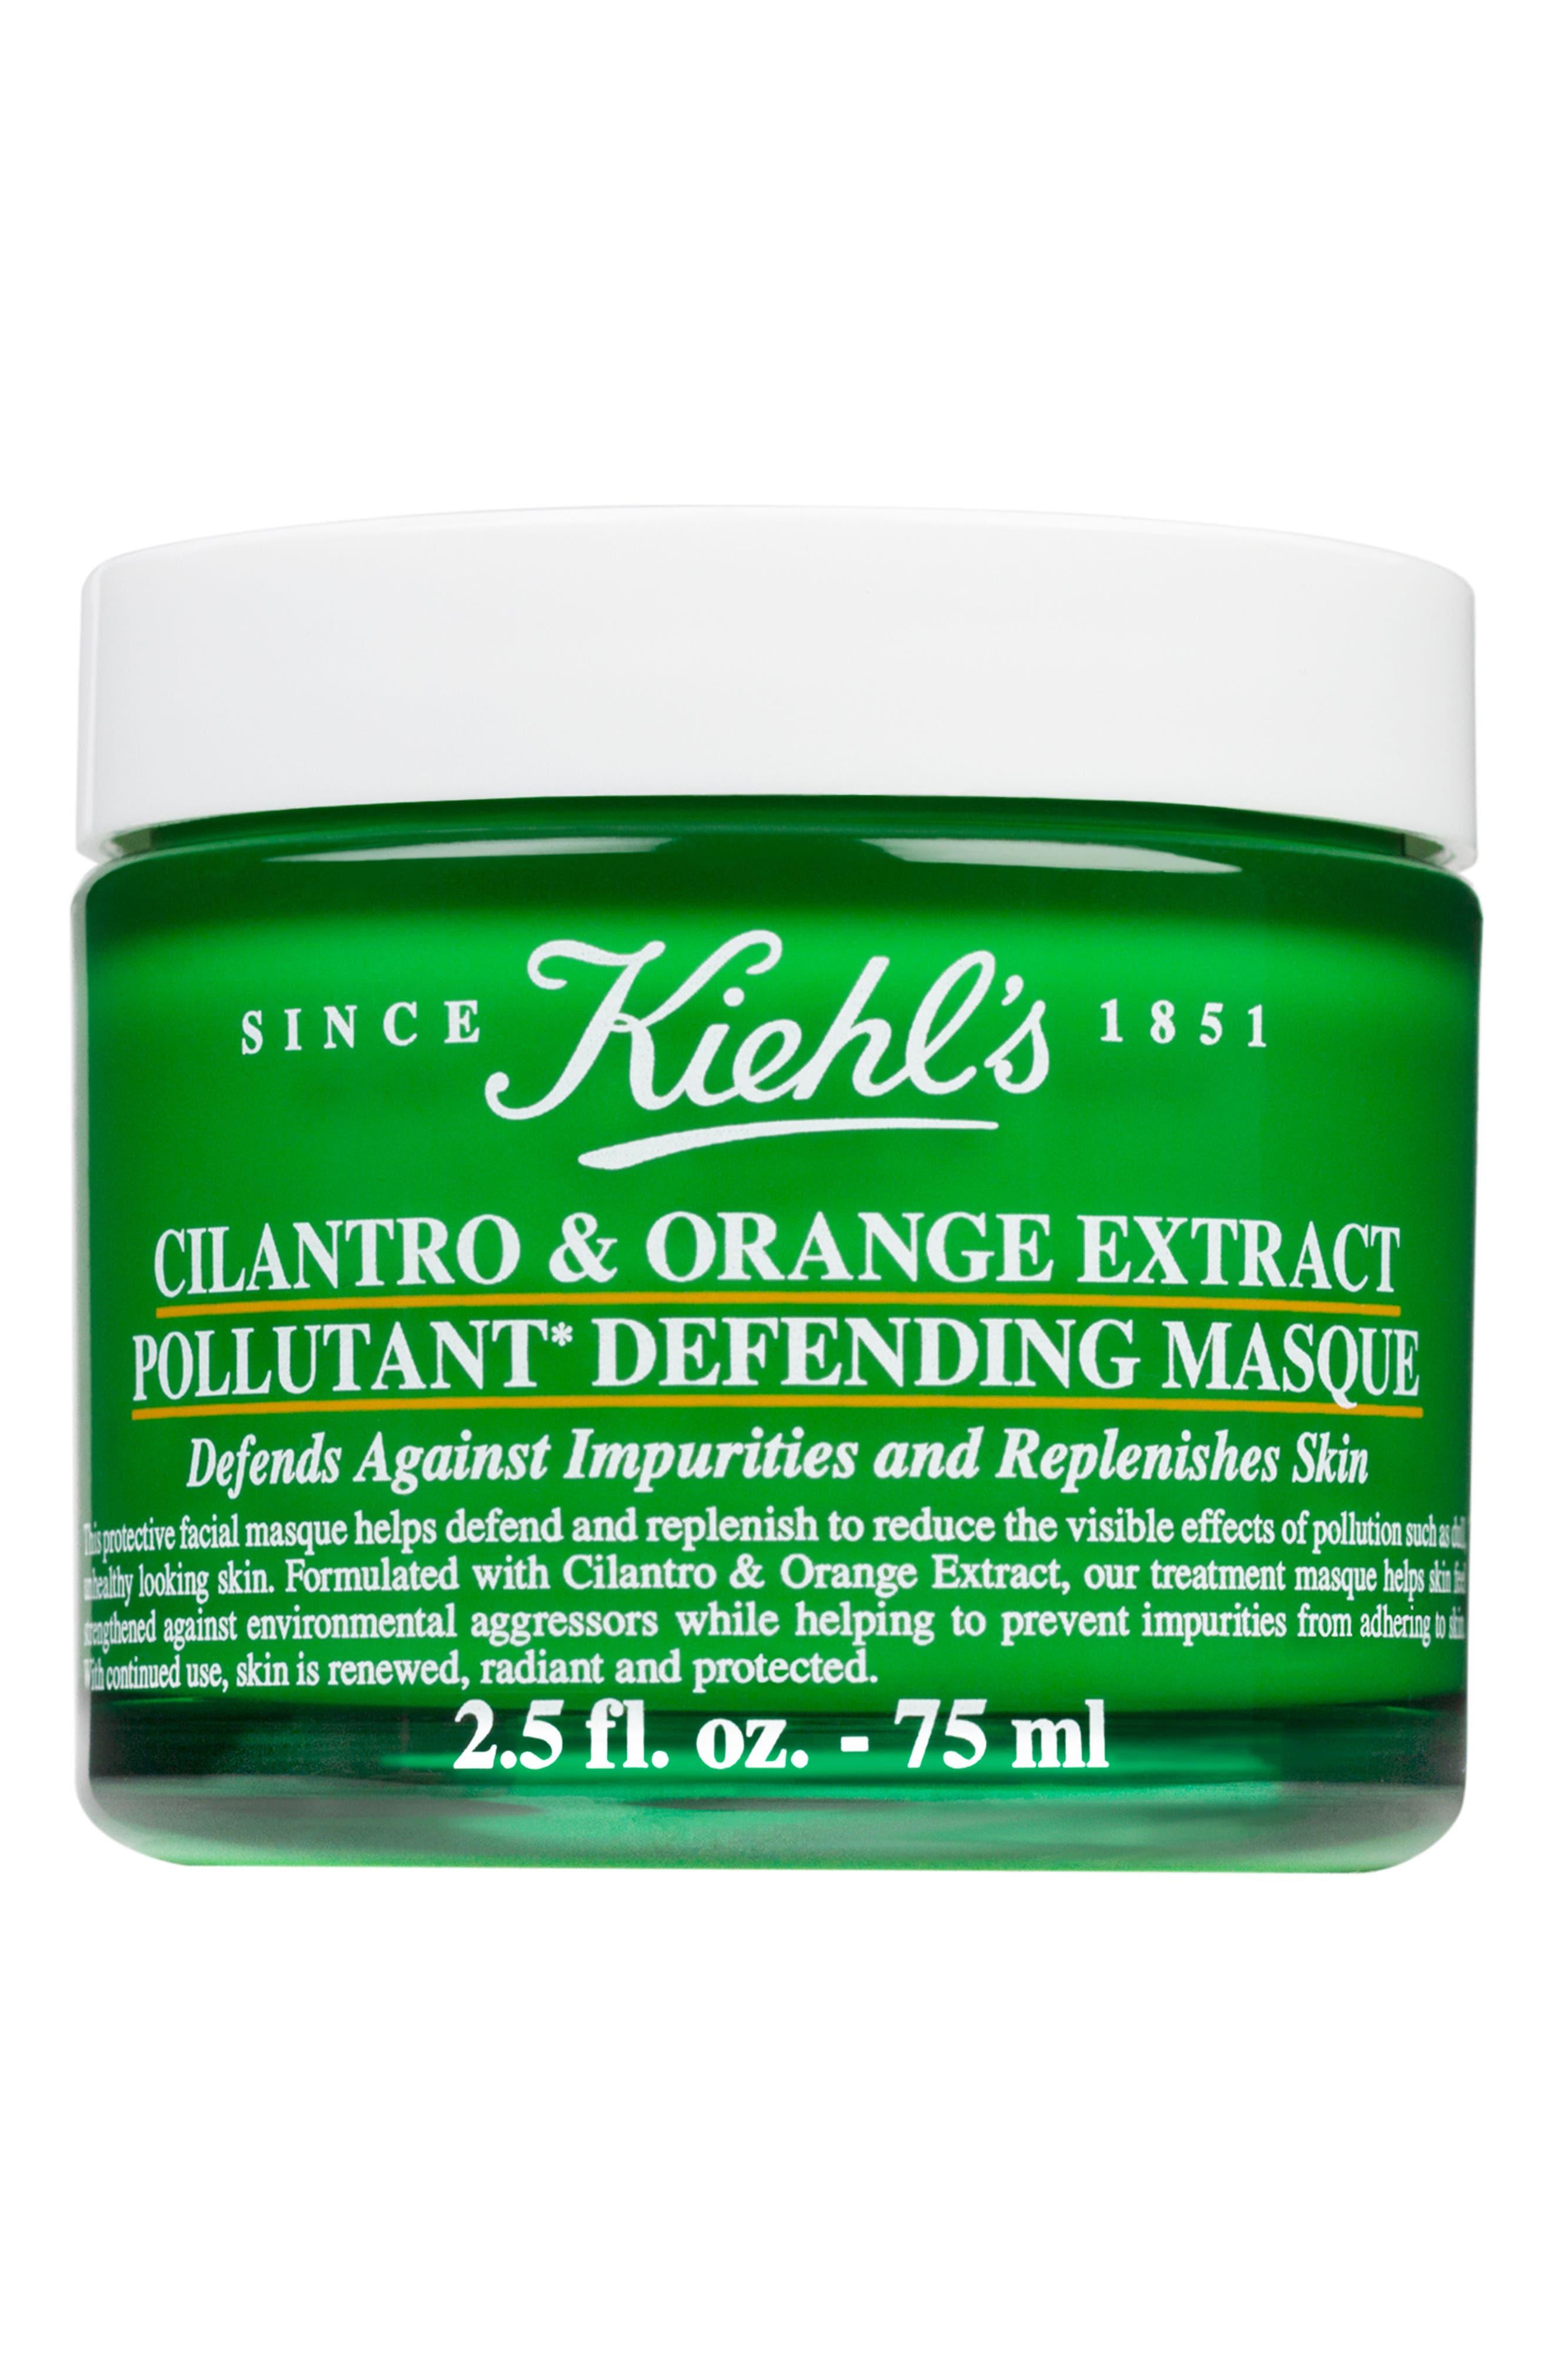 Kiehl's Since 1851 'Cilantro & Orange Extract' Pollutant Defending Masque